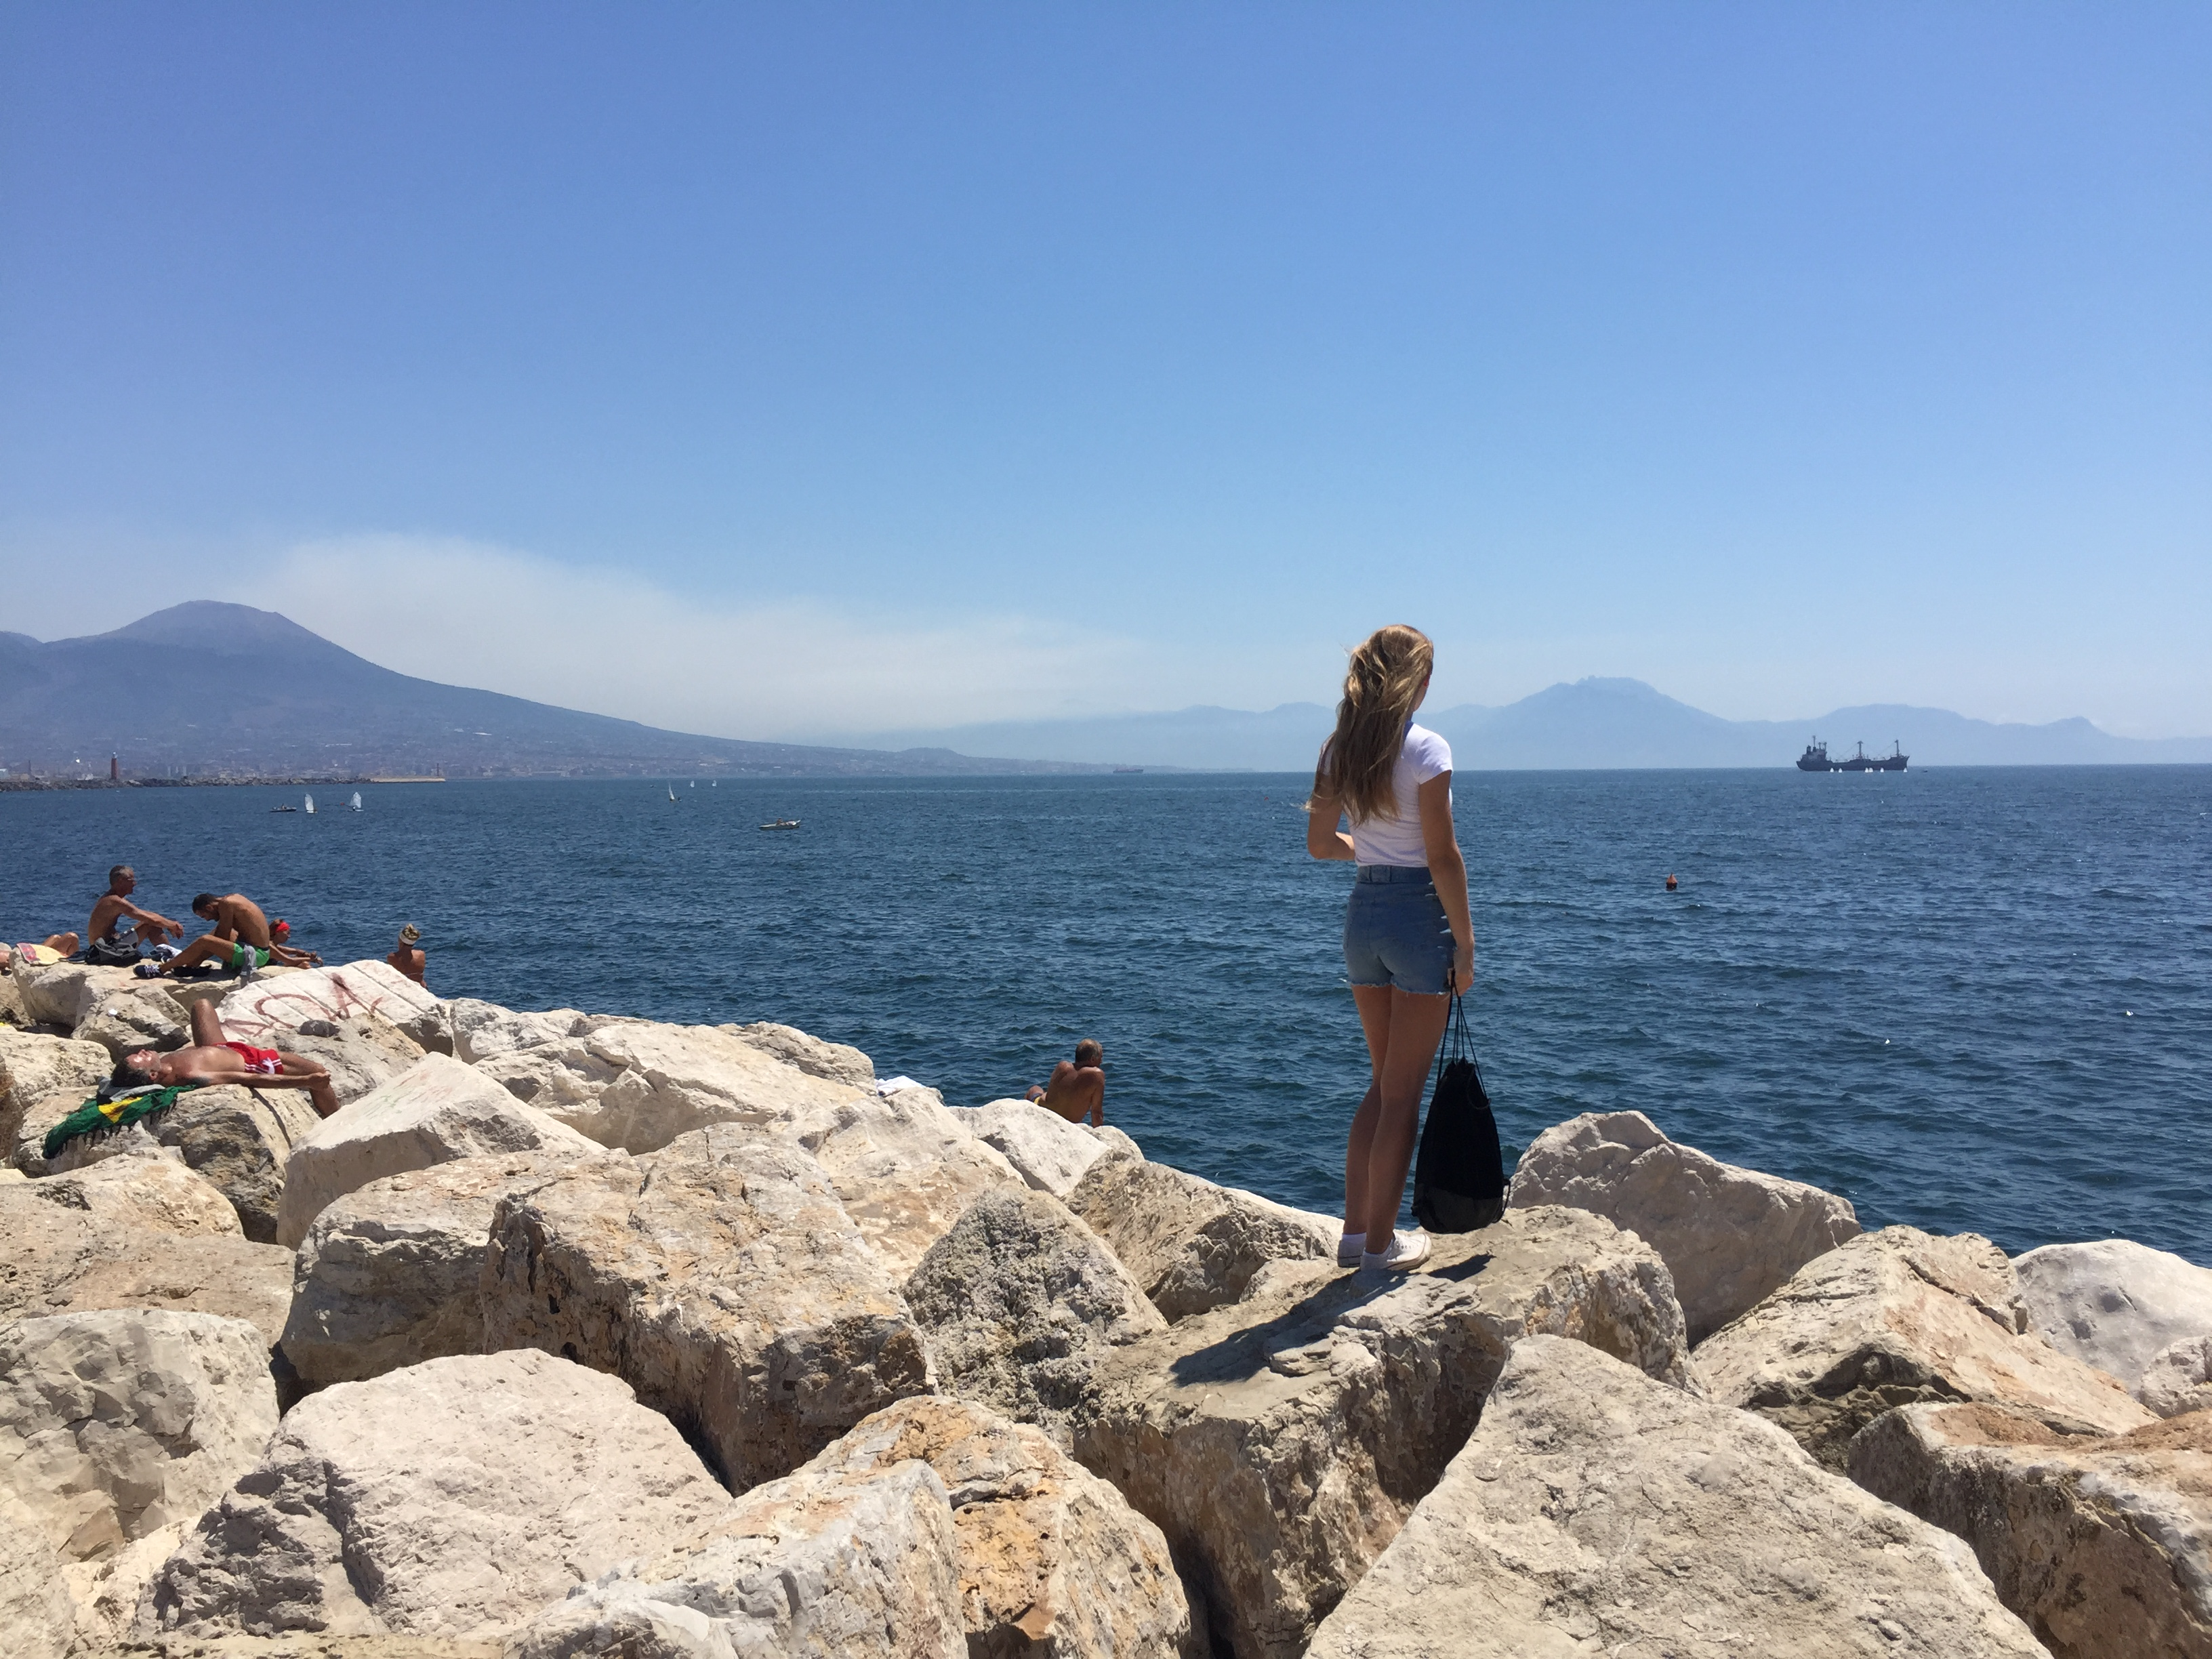 Neapel Capri ist nicht weit